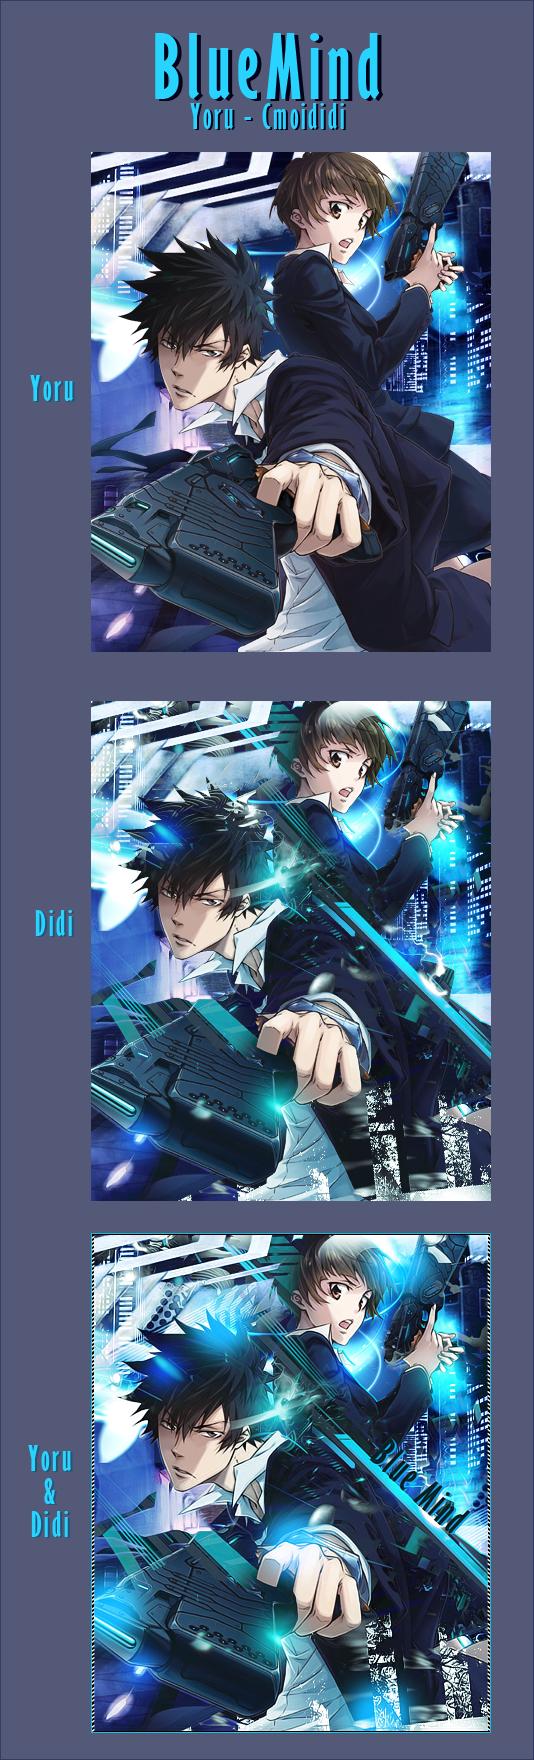 [cmoididi]Dessins/CREAs Blue_mind_by_cmoididi-d66xyqx